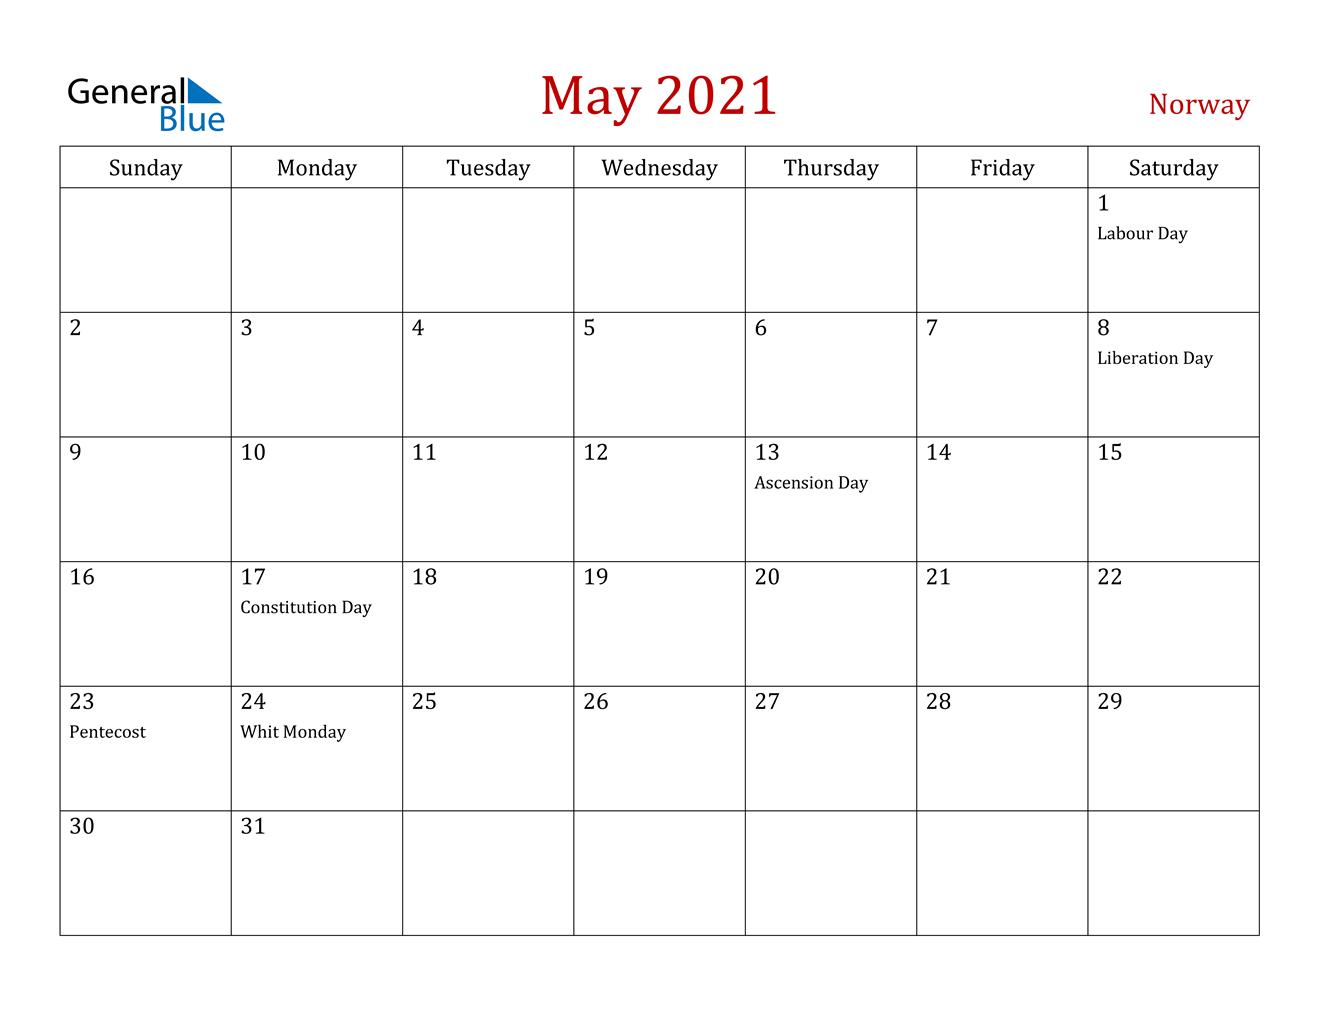 May 2021 Calendar - Norway